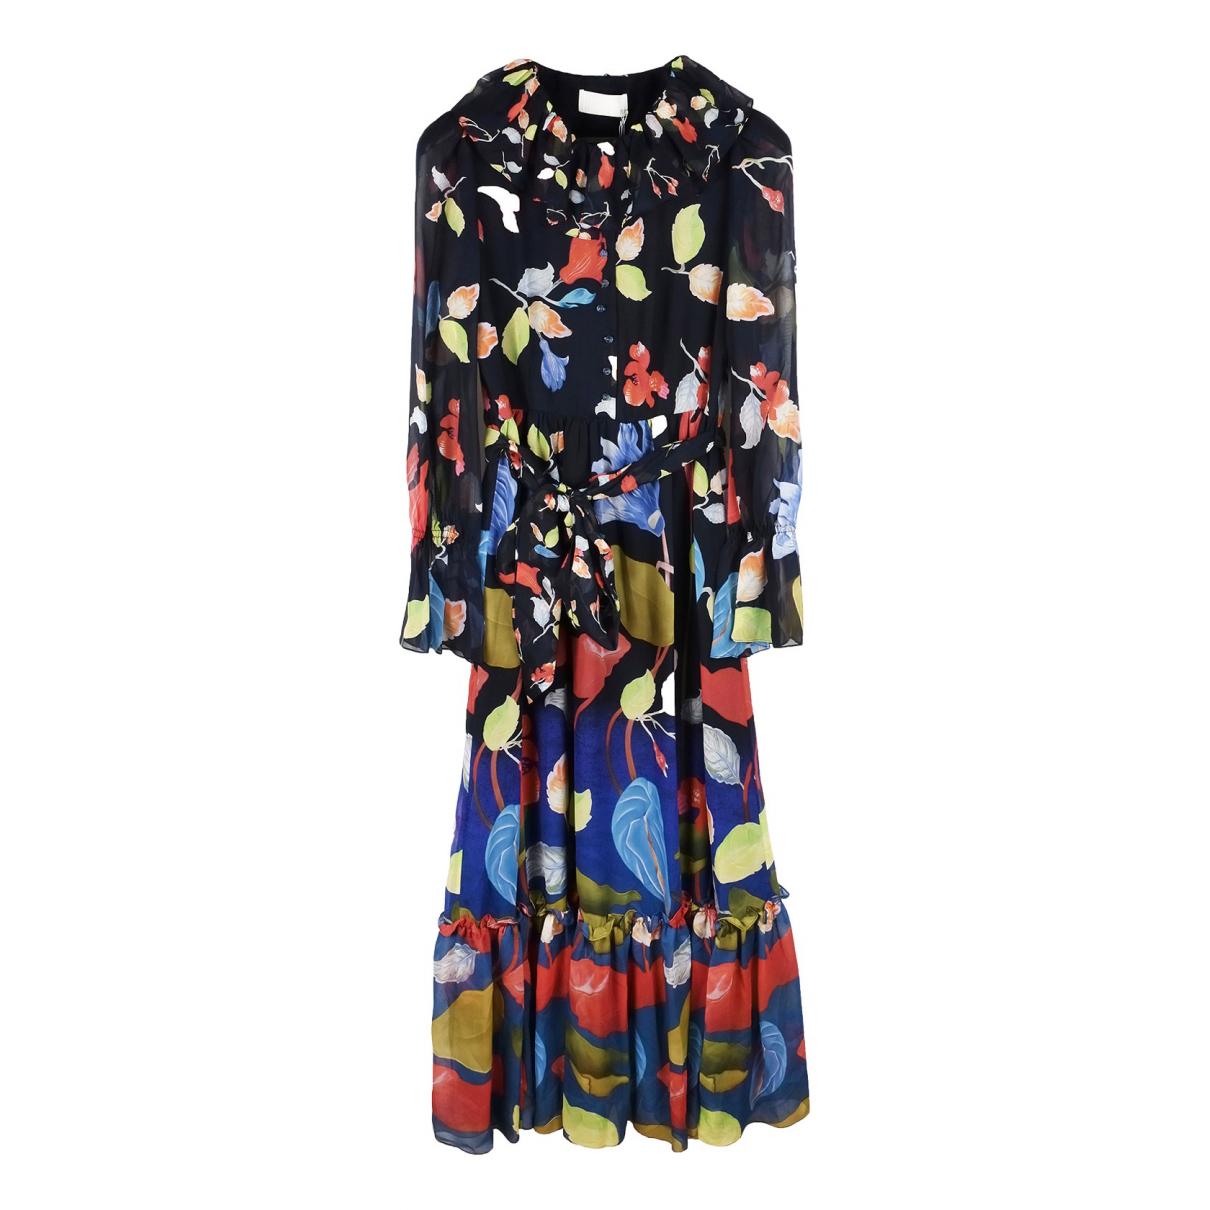 Peter Pilotto \N Multicolour dress for Women 12 UK